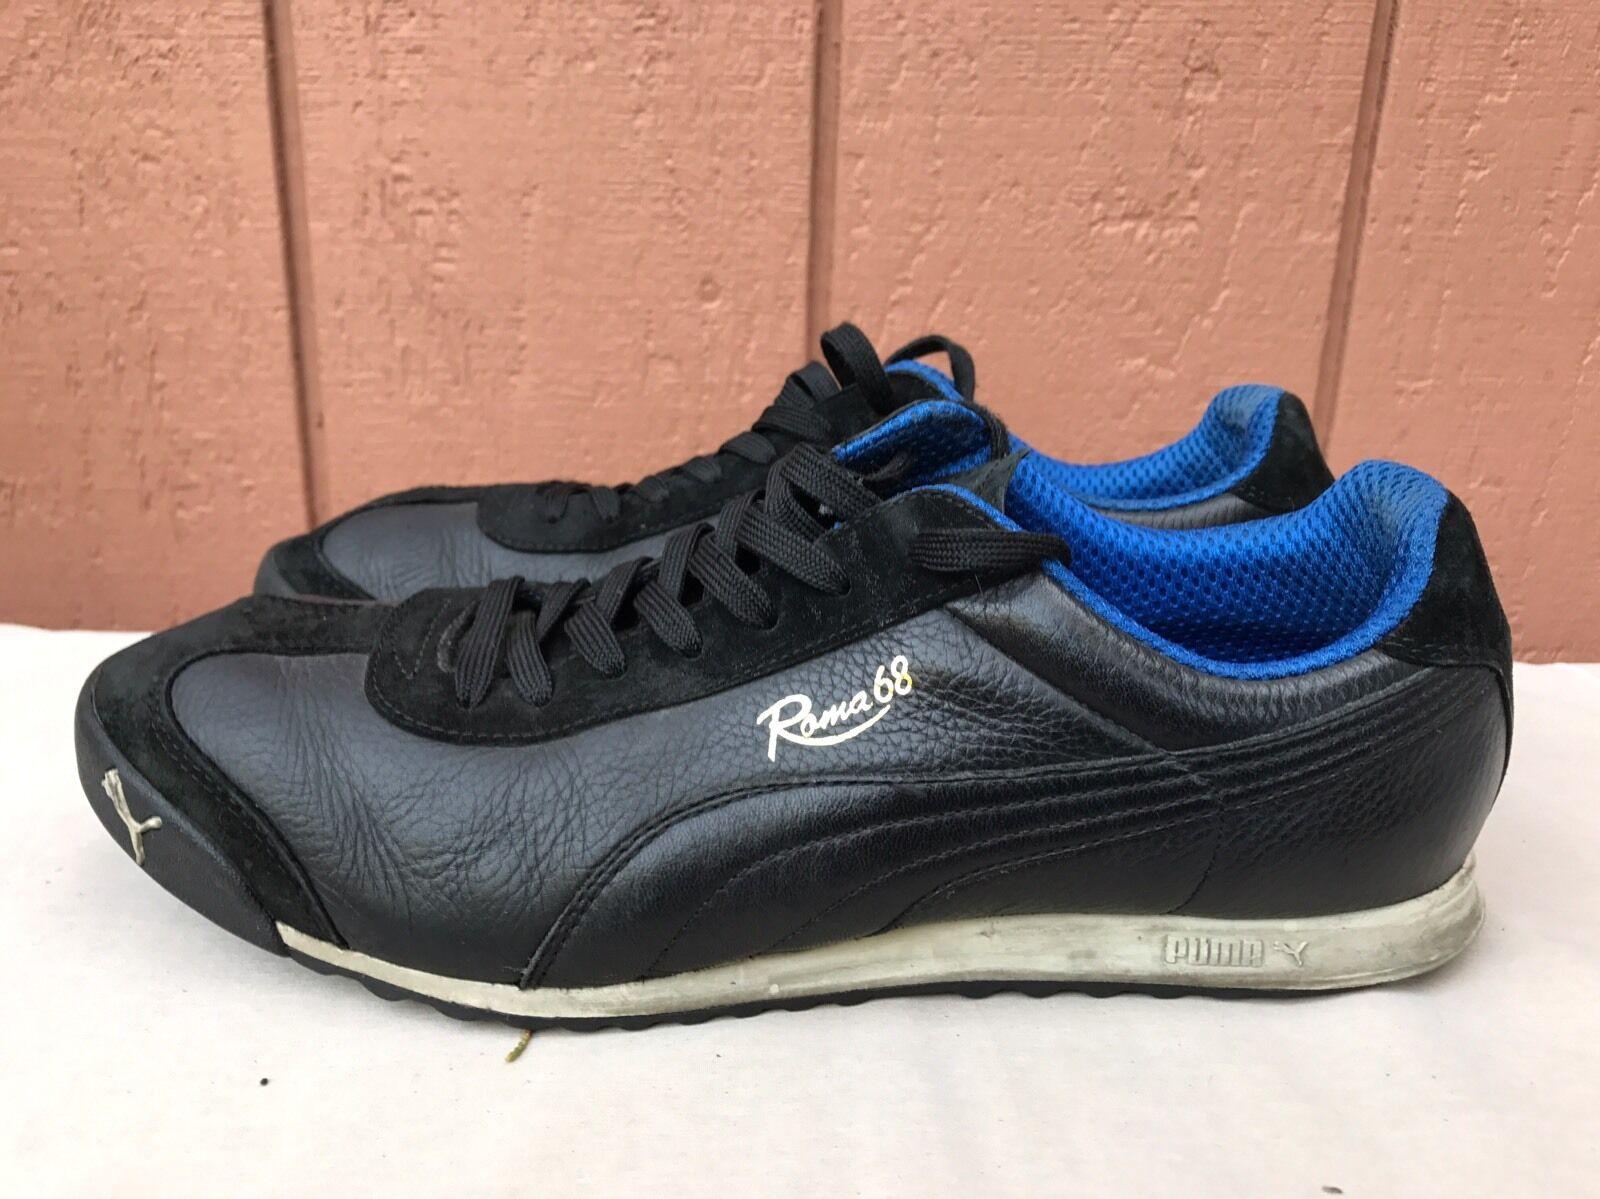 Rare Puma Roma 68 base cuero negro marca vintage zapatillas zapatillas  zapatillas hombres a58da9 dc38d9b7bf